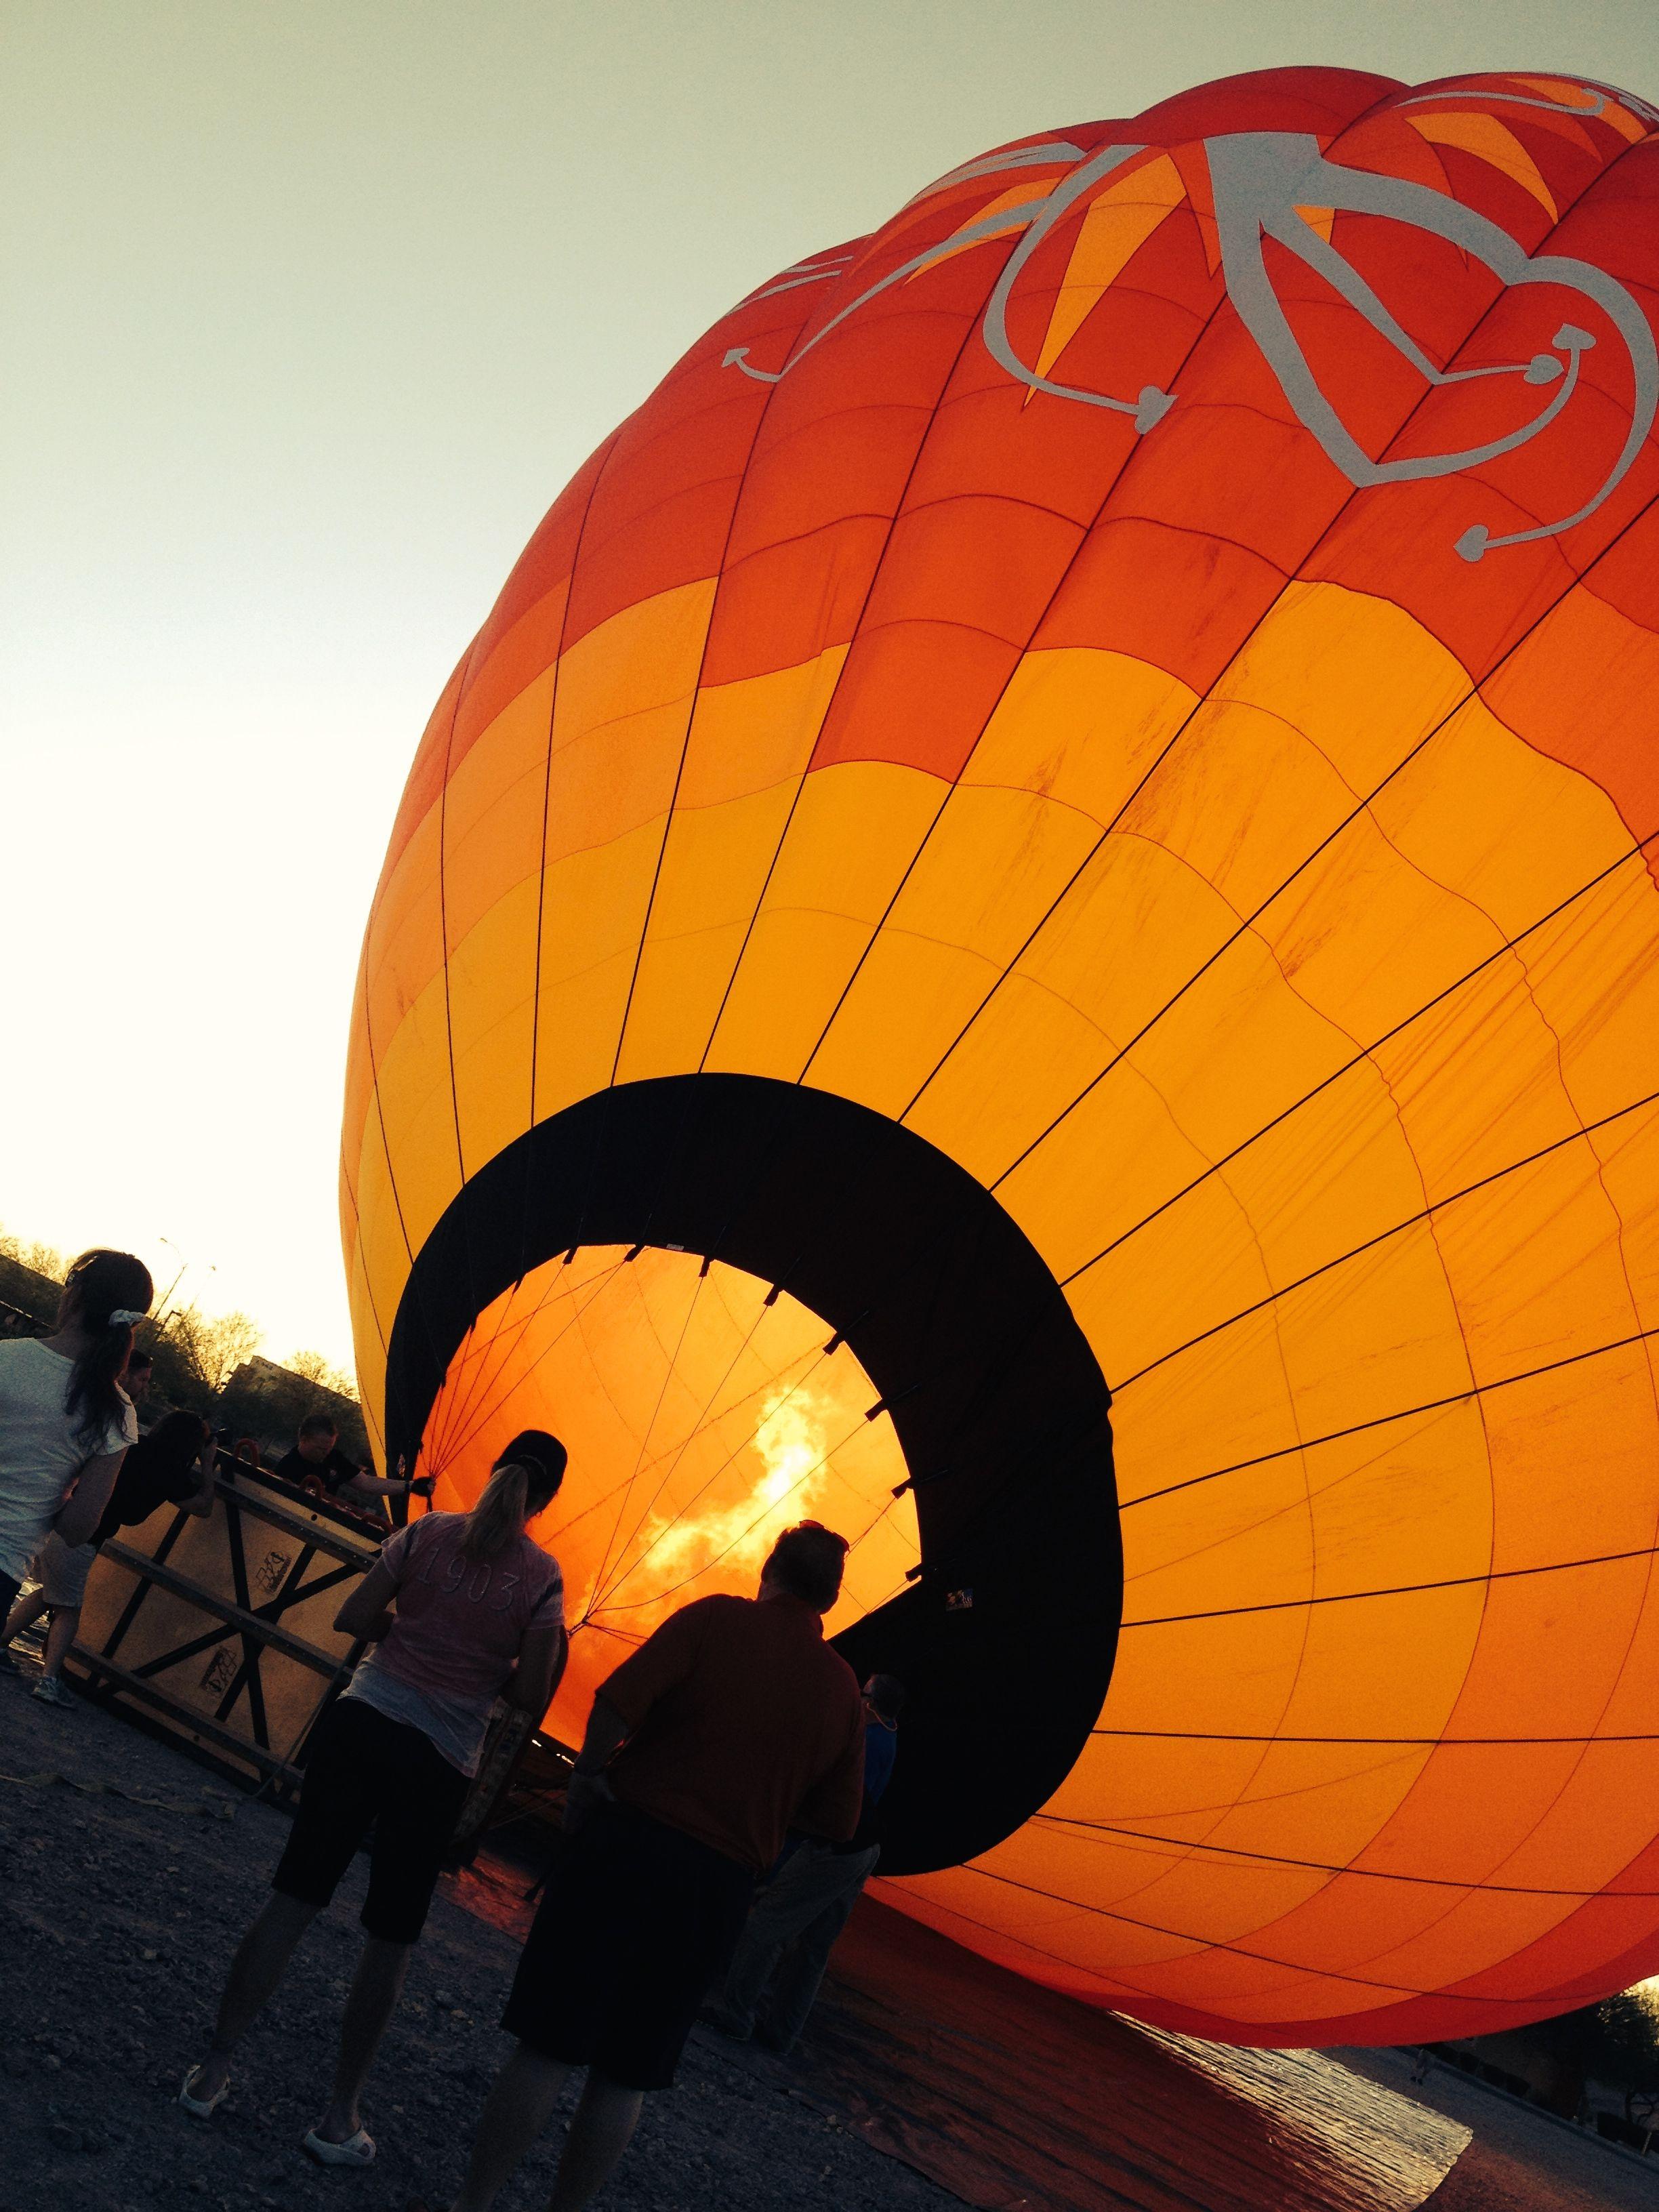 Premium hot air balloon rides in Las Vegas, NV. We offer